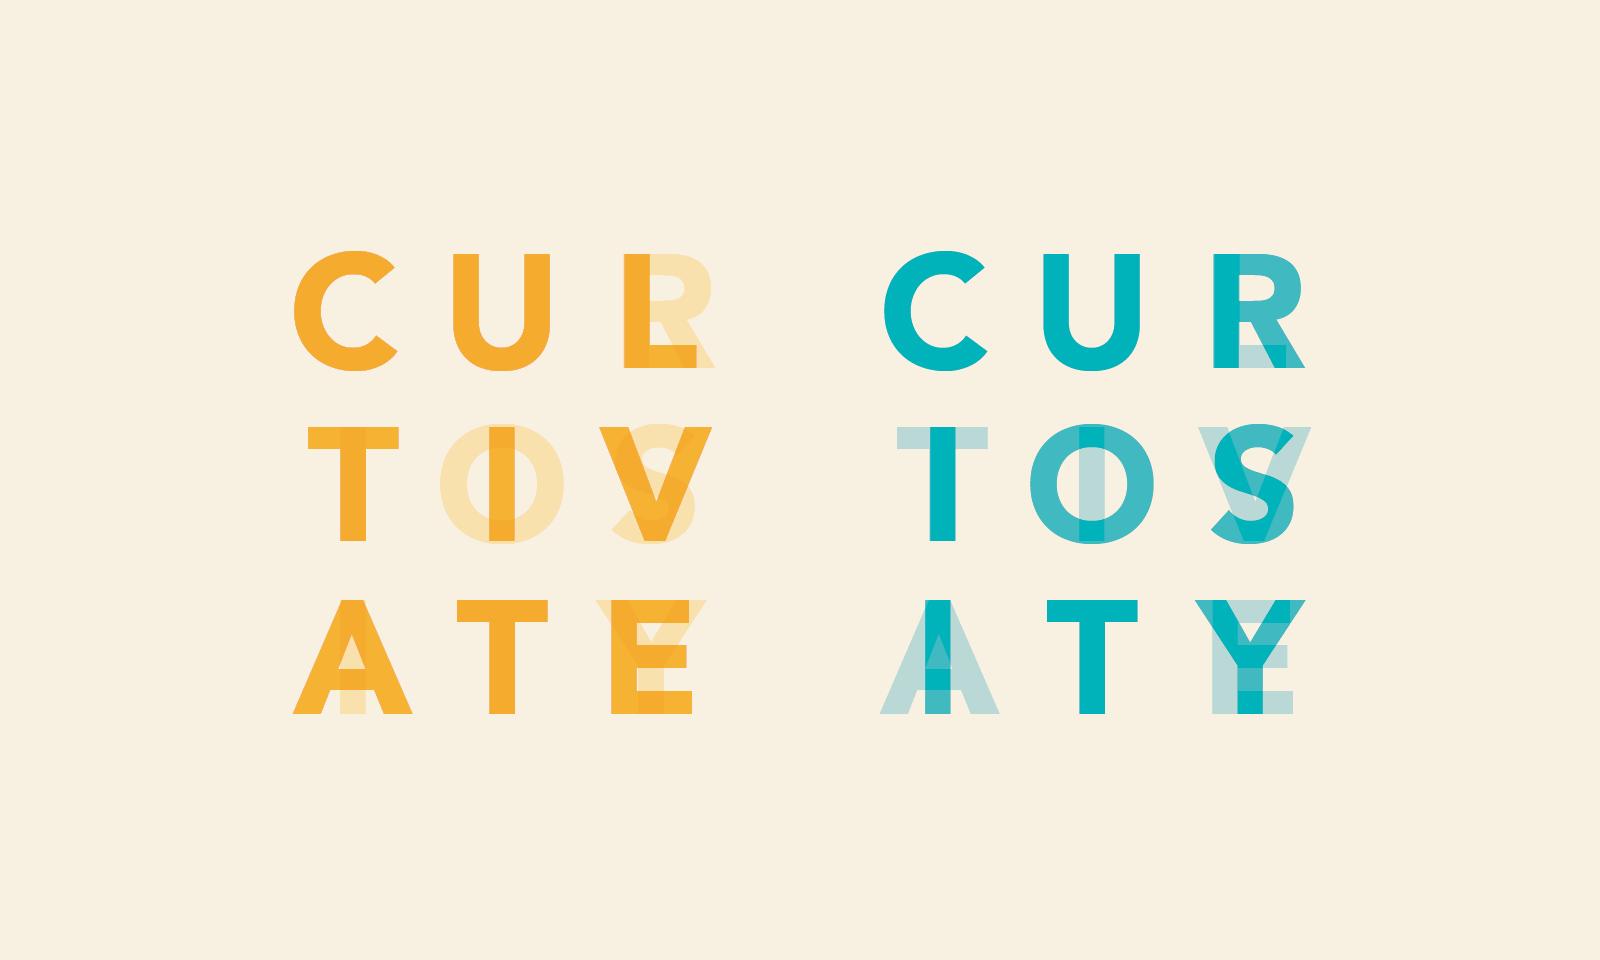 Cultivate_Curiosity